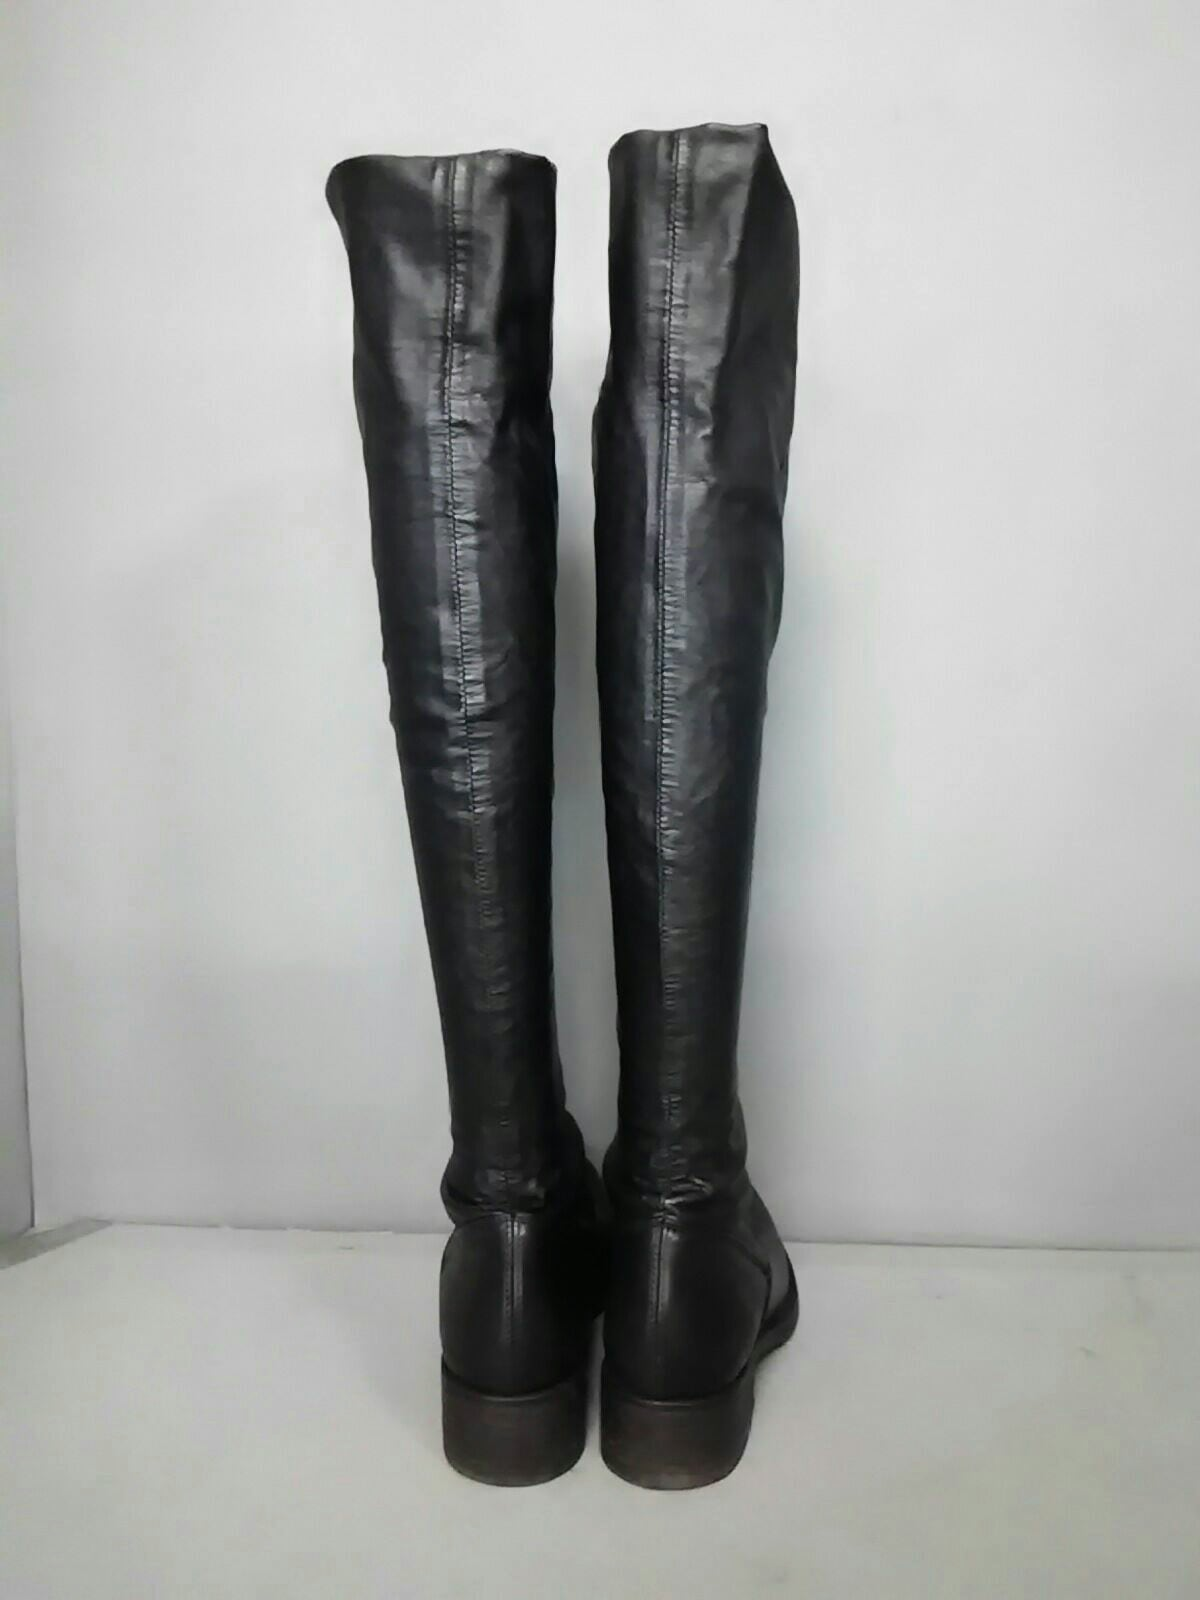 ELENA IACHI(エレナイアチ)のブーツ